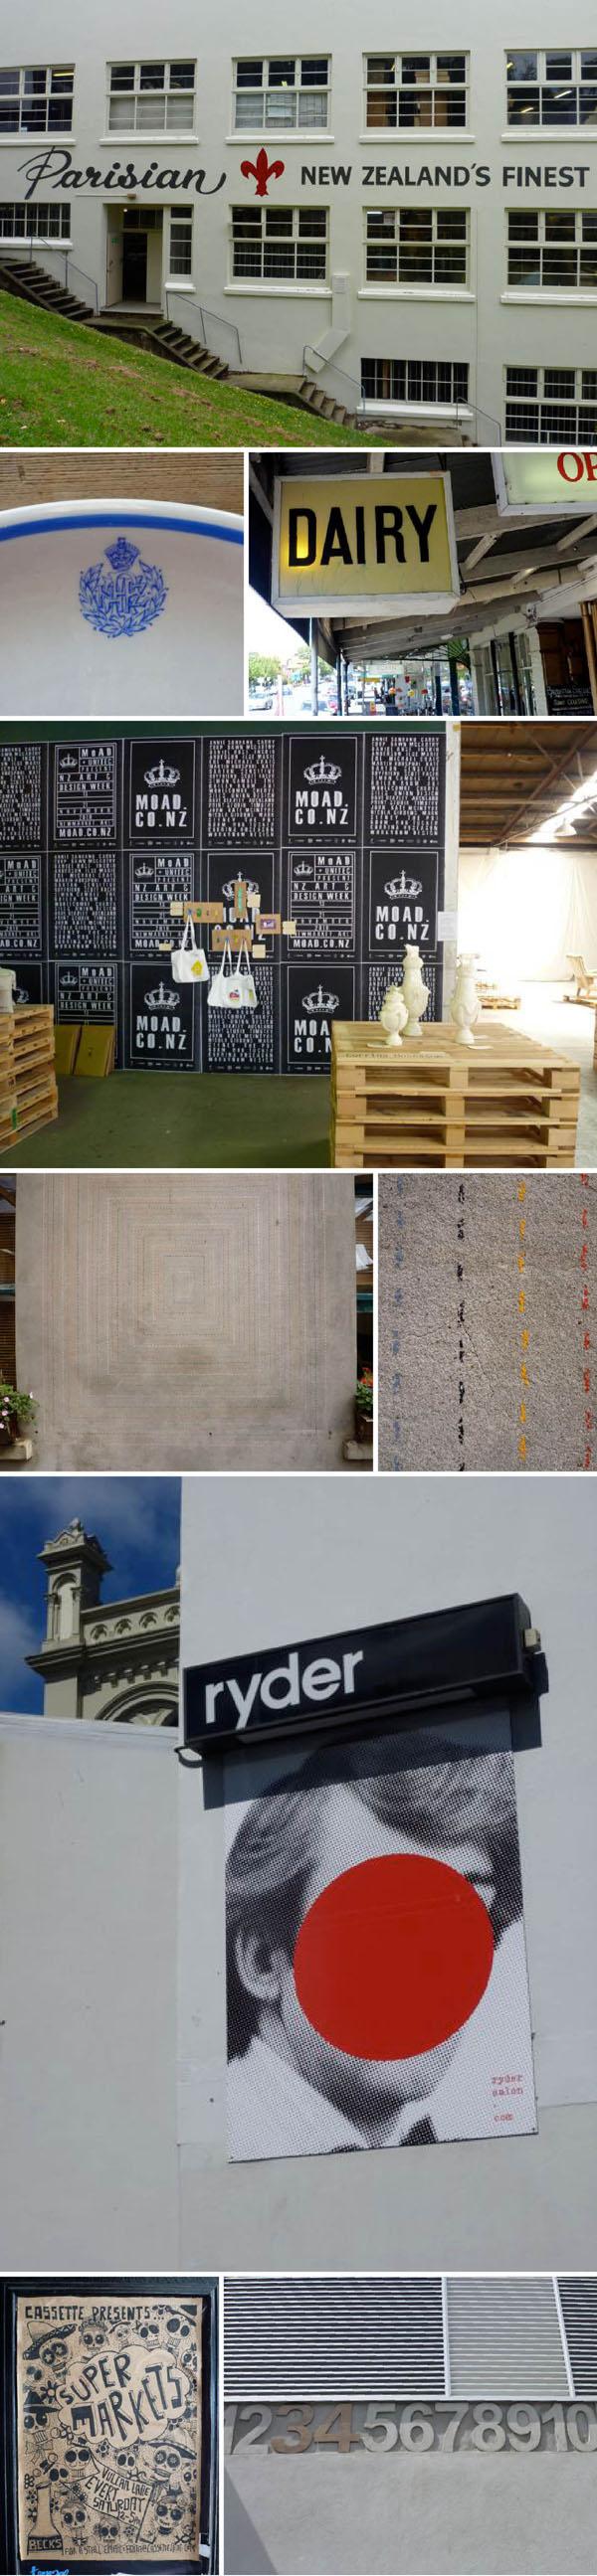 Auckland_design_RPRKR